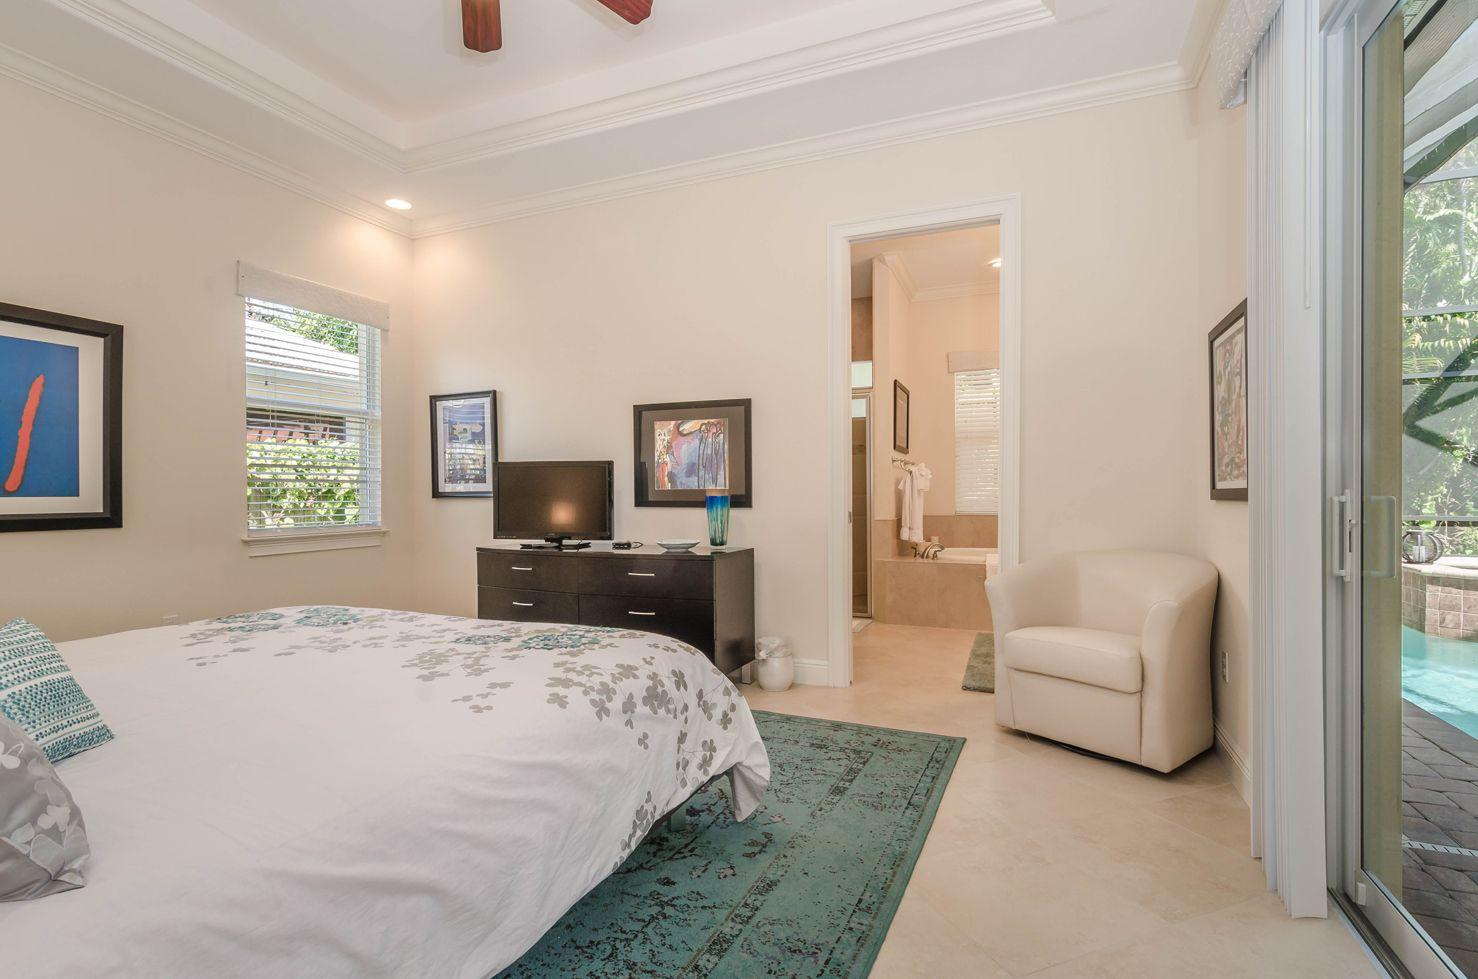 Master bedroom with 2 beds  Master Bedroom   SOLD   th Ave N  Pinterest  Master bedroom